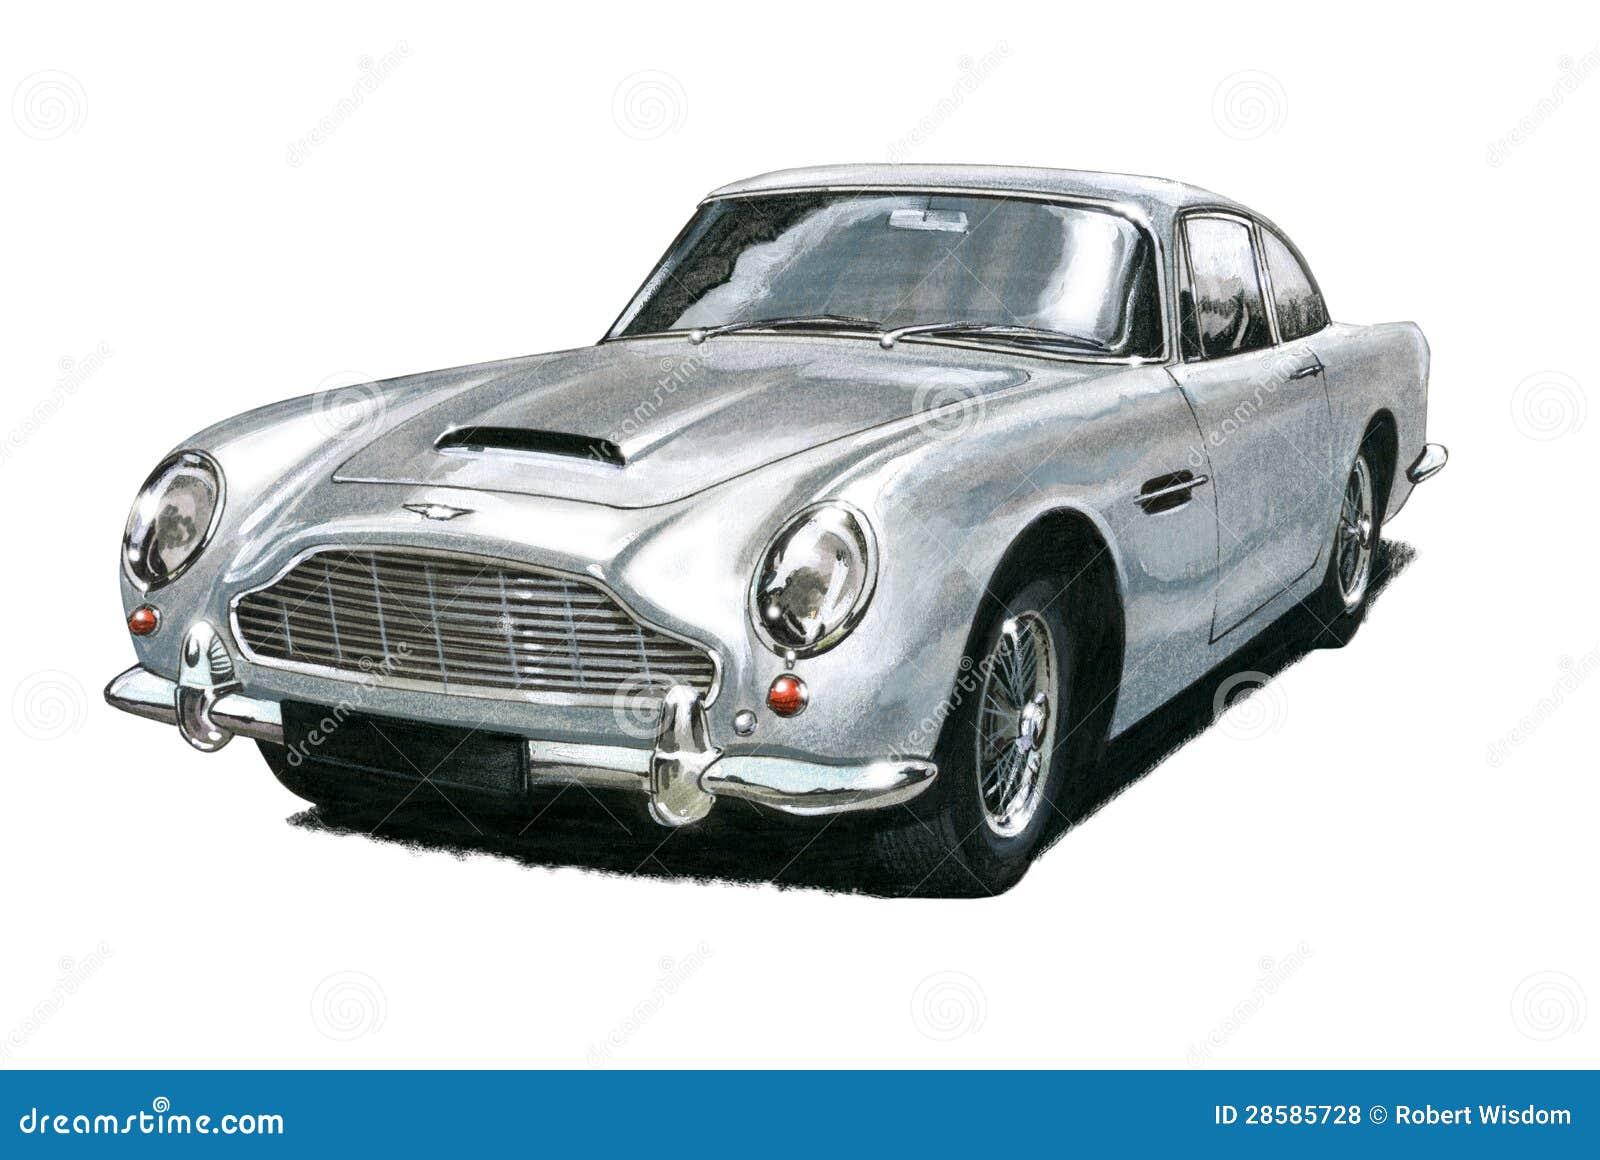 Aston Martin DB5 Editorial Stock Photo - Image: 28585728